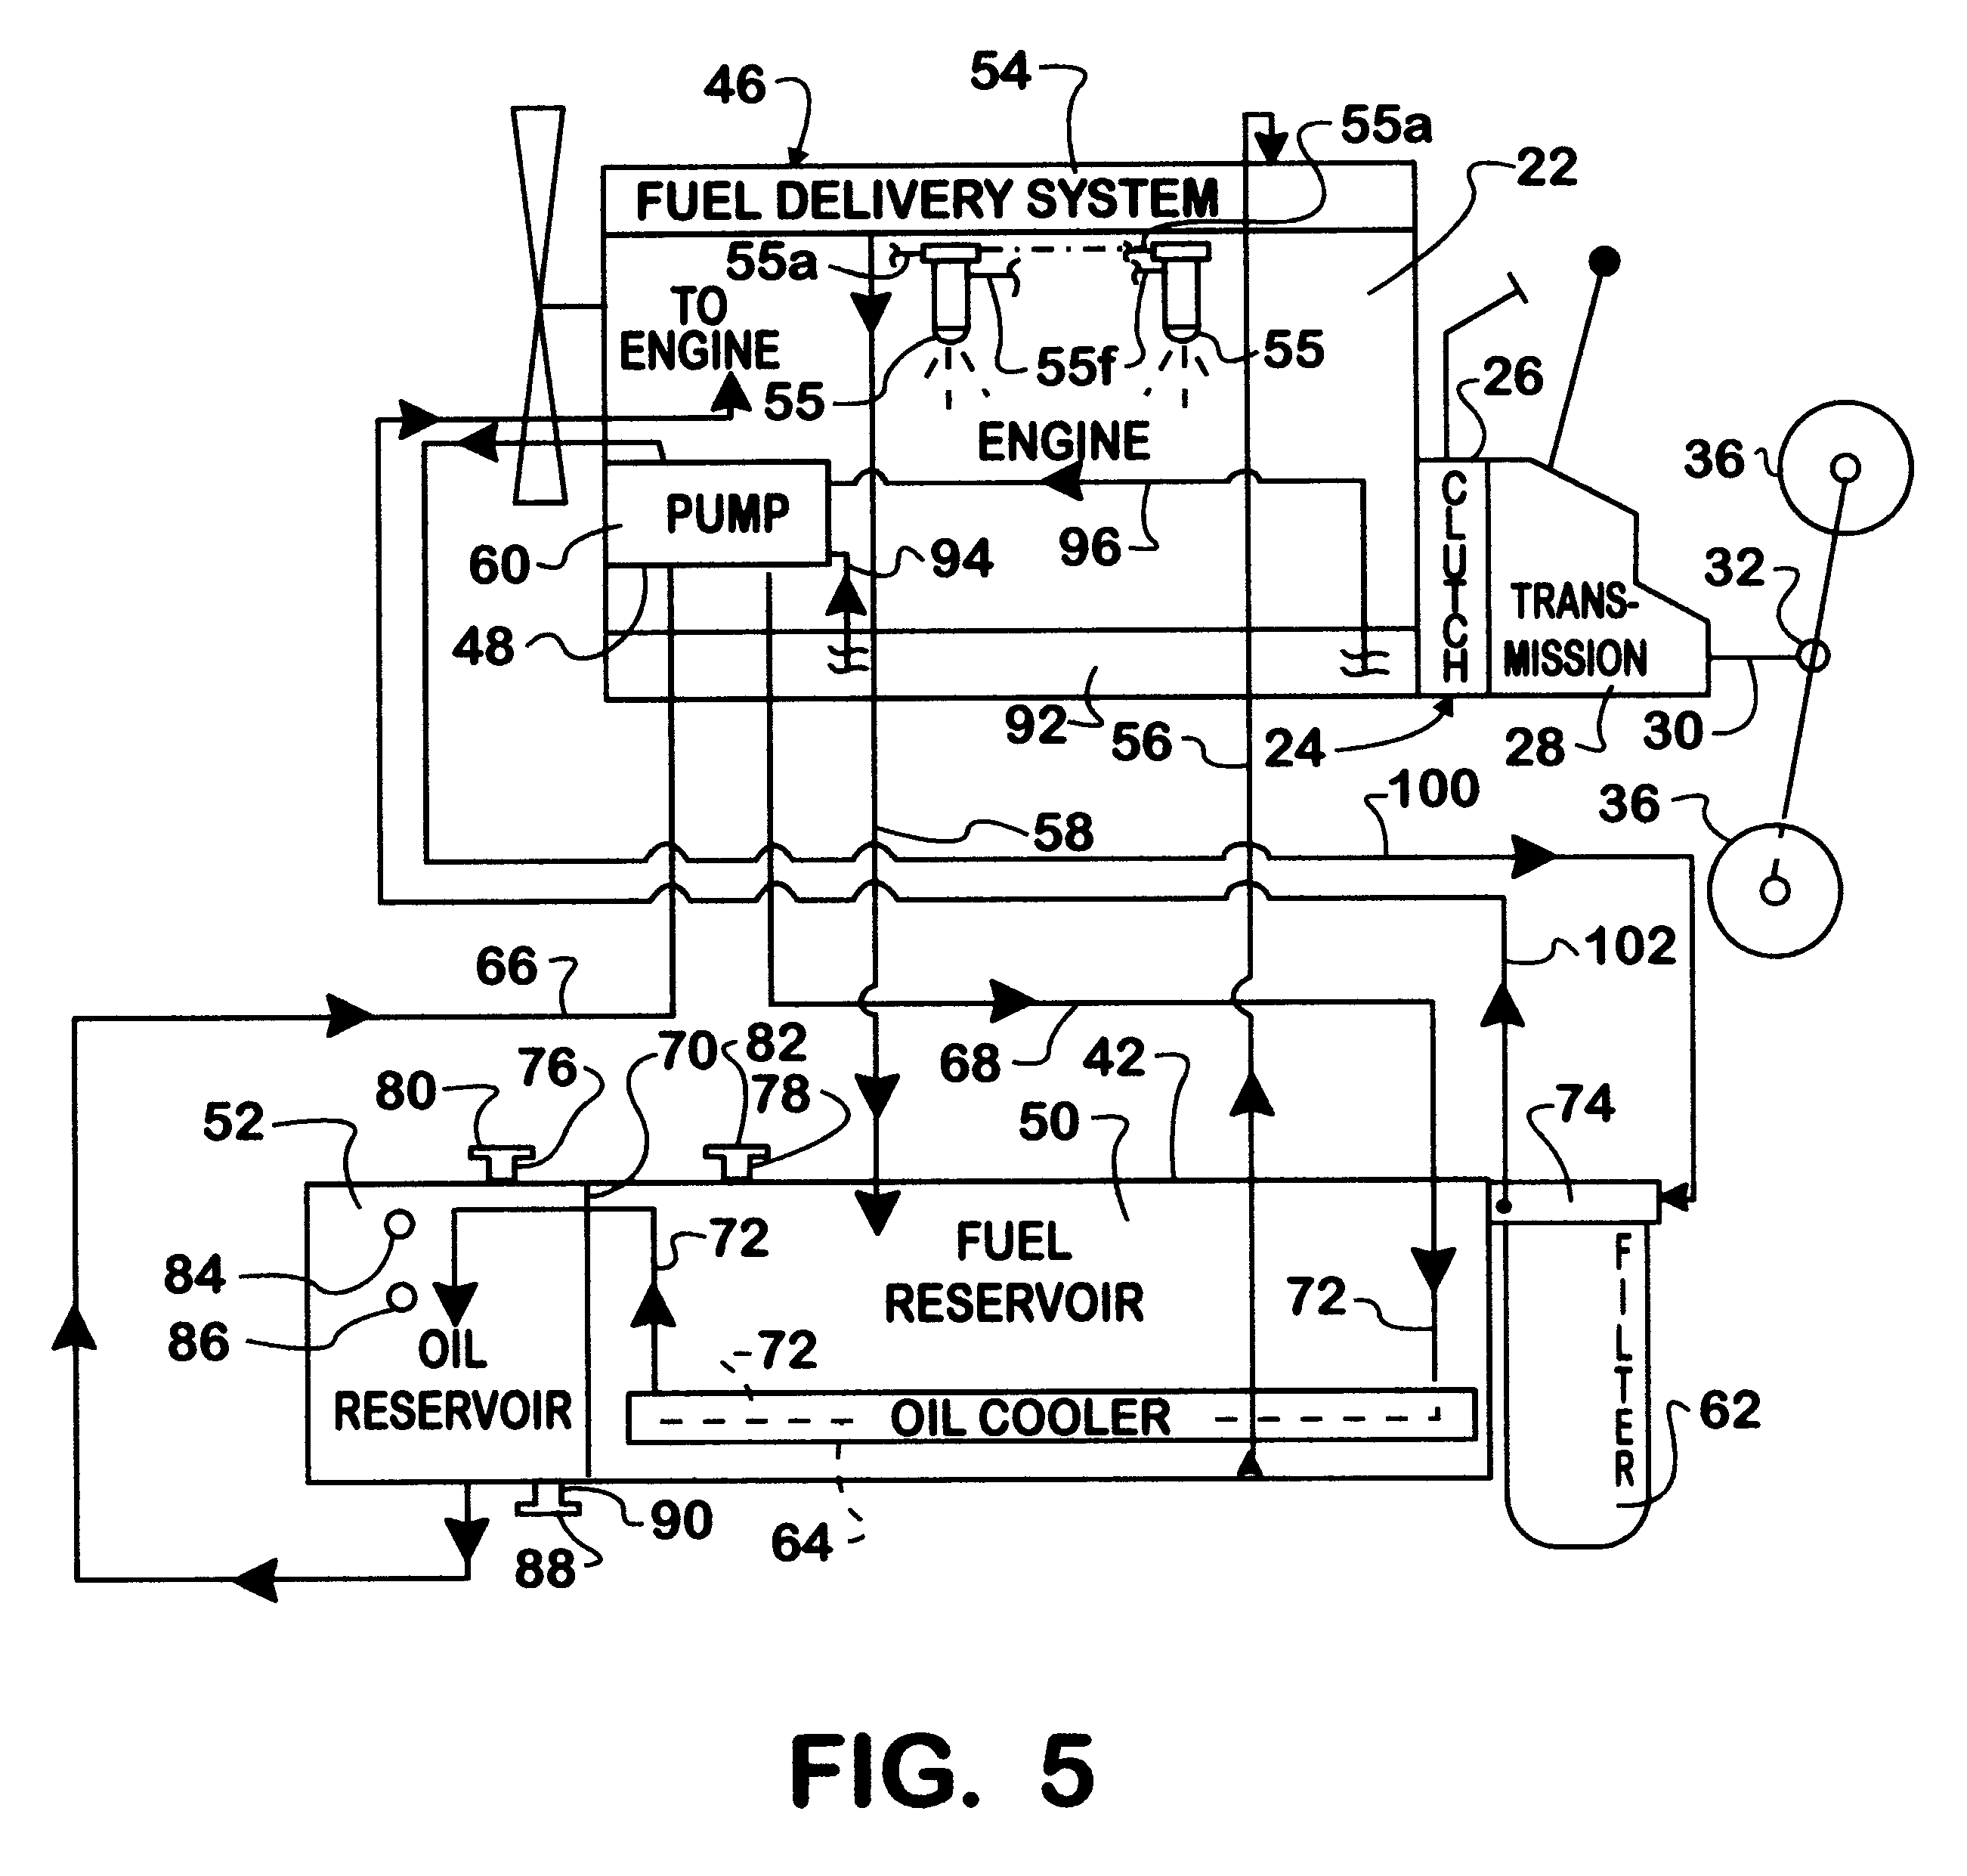 airplane engine piston aircraft diagram html